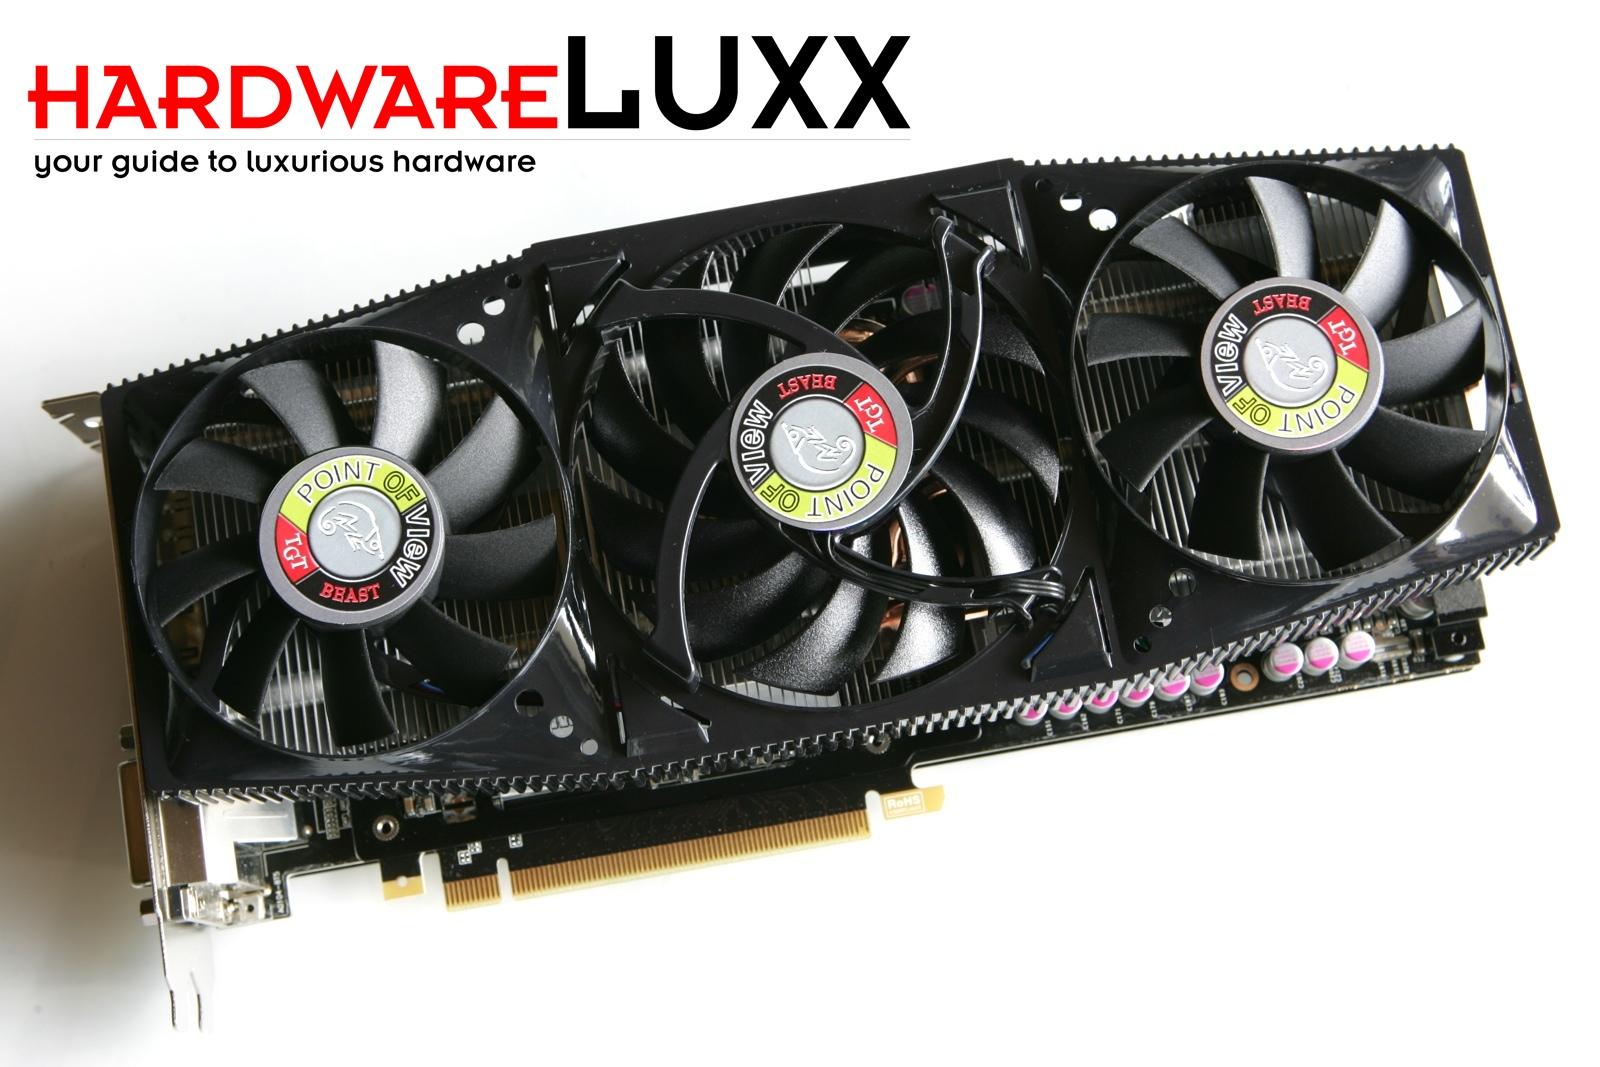 Тест и обзор: три GeForce GTX 680 от EVGA, Gigabyte и POV: https://www.hardwareluxx.ru/index.php/artikel/hardware/grafikkarten/23019-test-3x-geforce-gtx-680.html?start=17